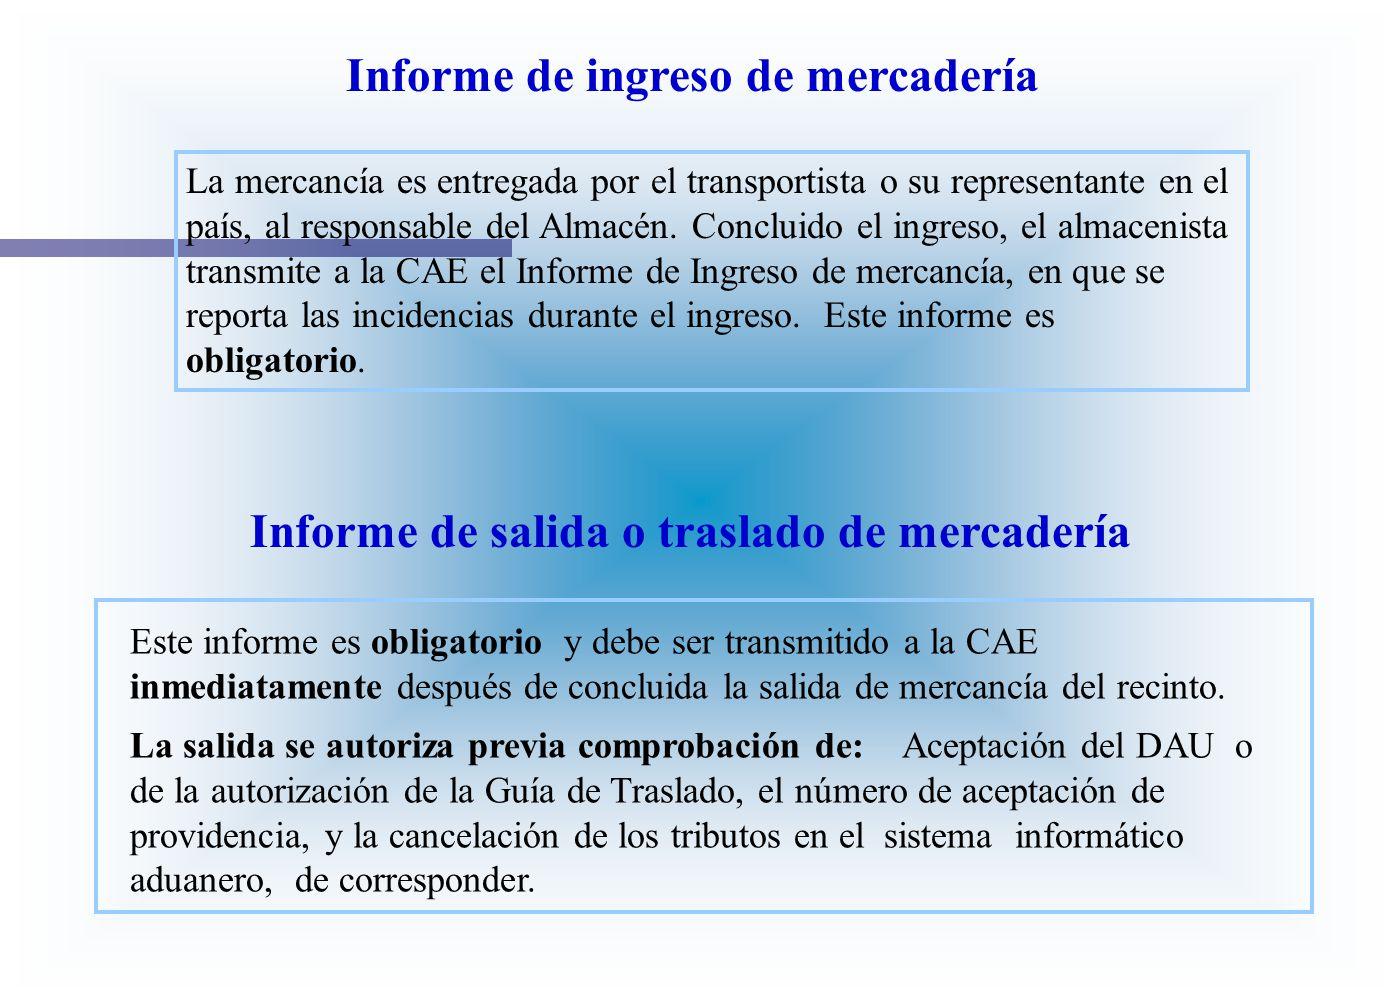 Informe de ingreso de mercadería